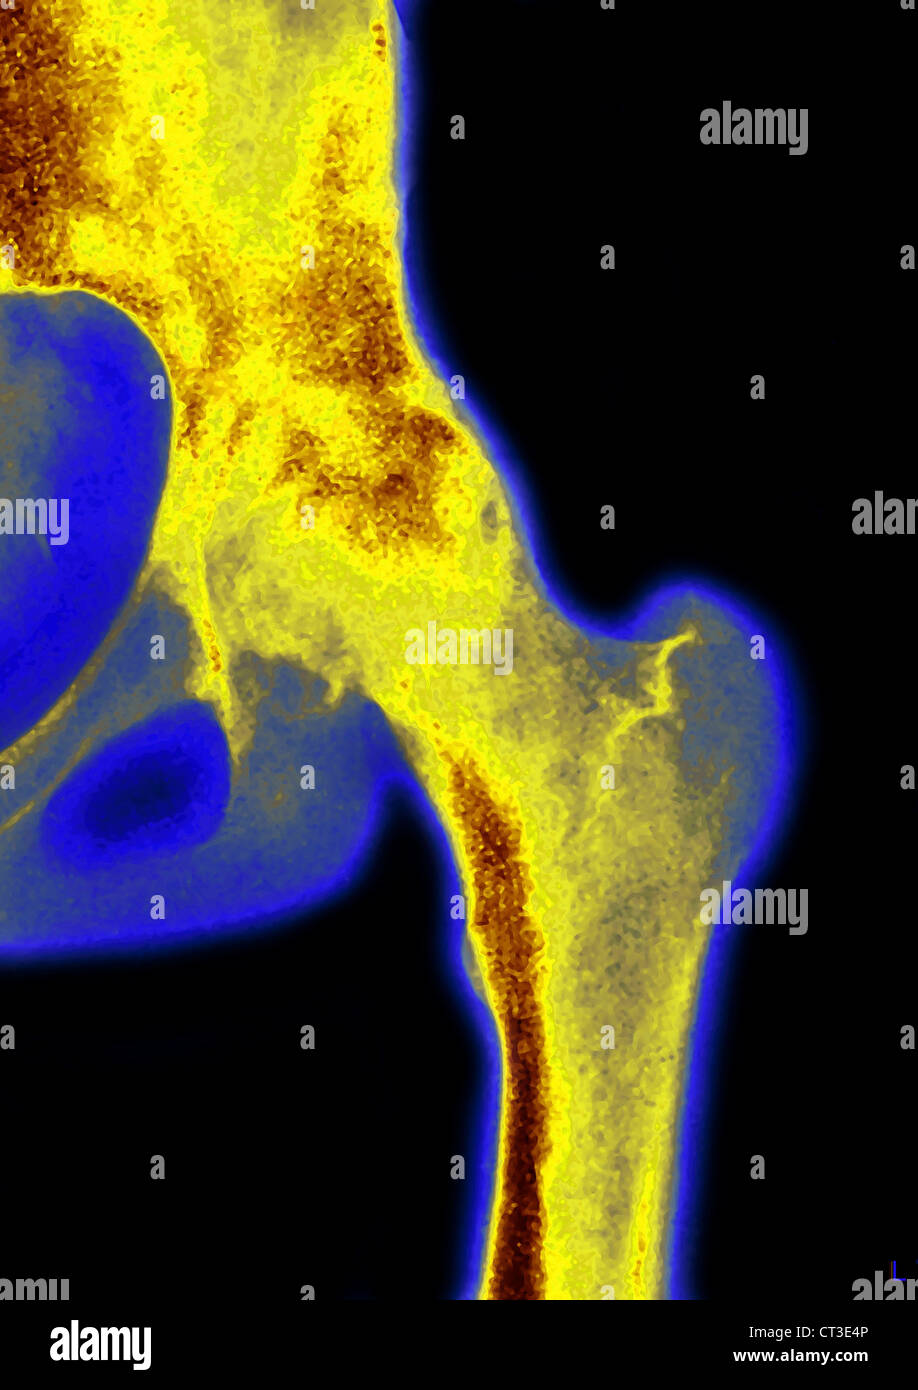 HIP OSTEOARTHRITIS, X-RAY - Stock Image